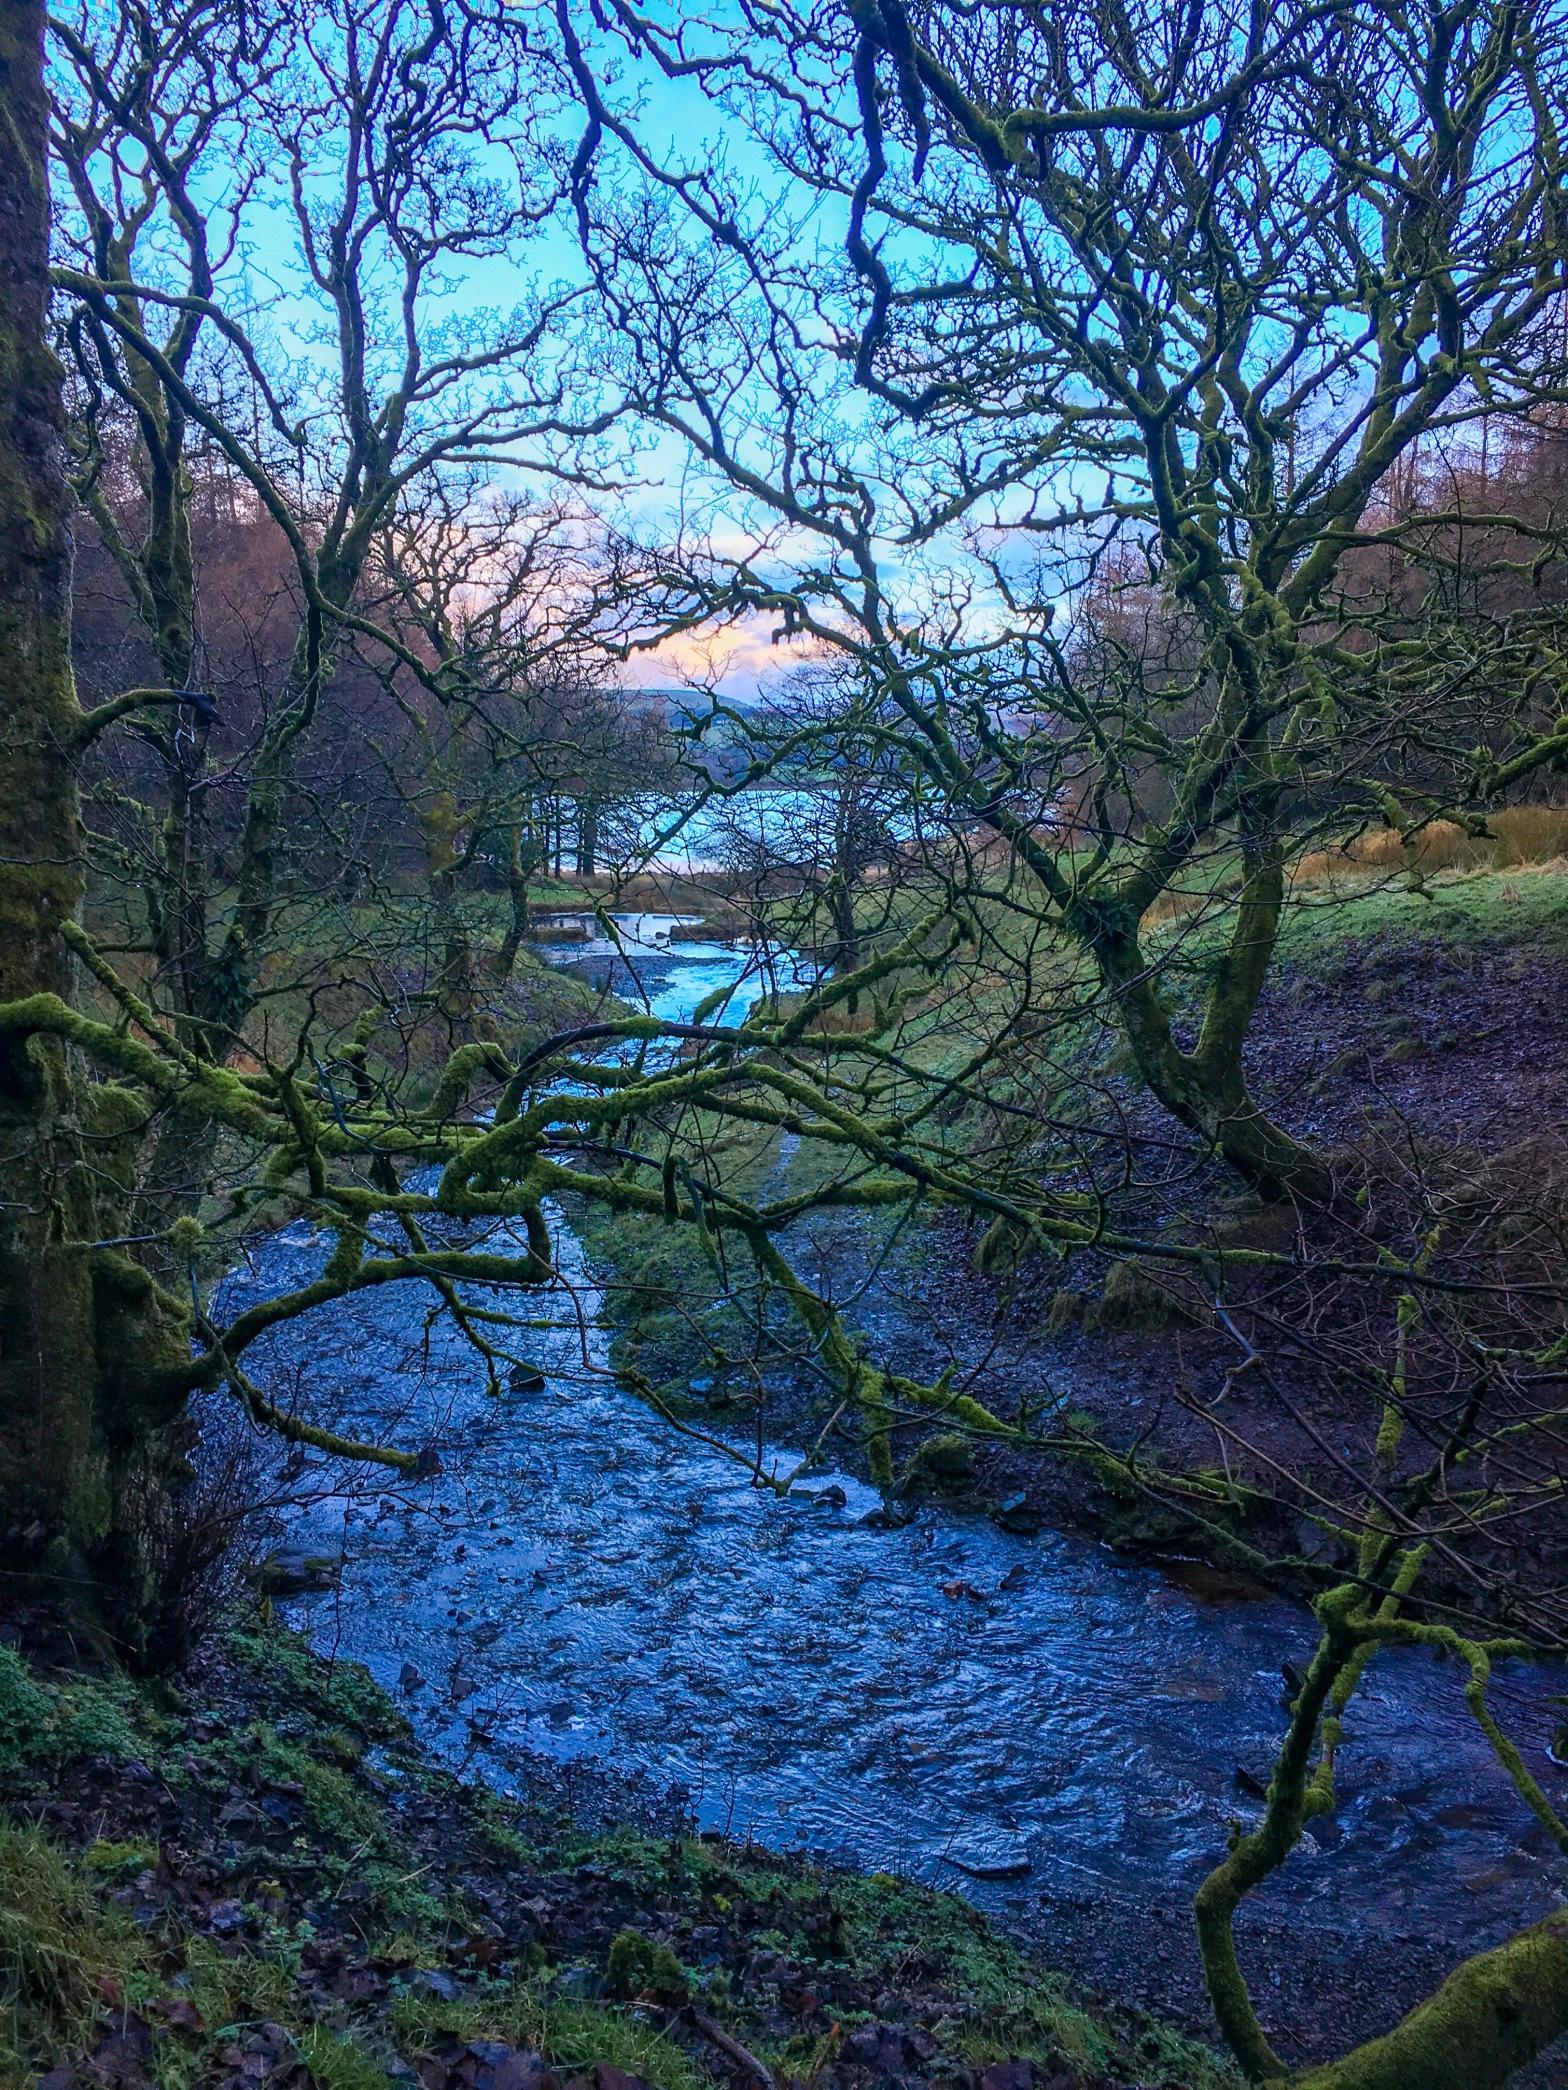 Picturesque fairy glen in Northern England